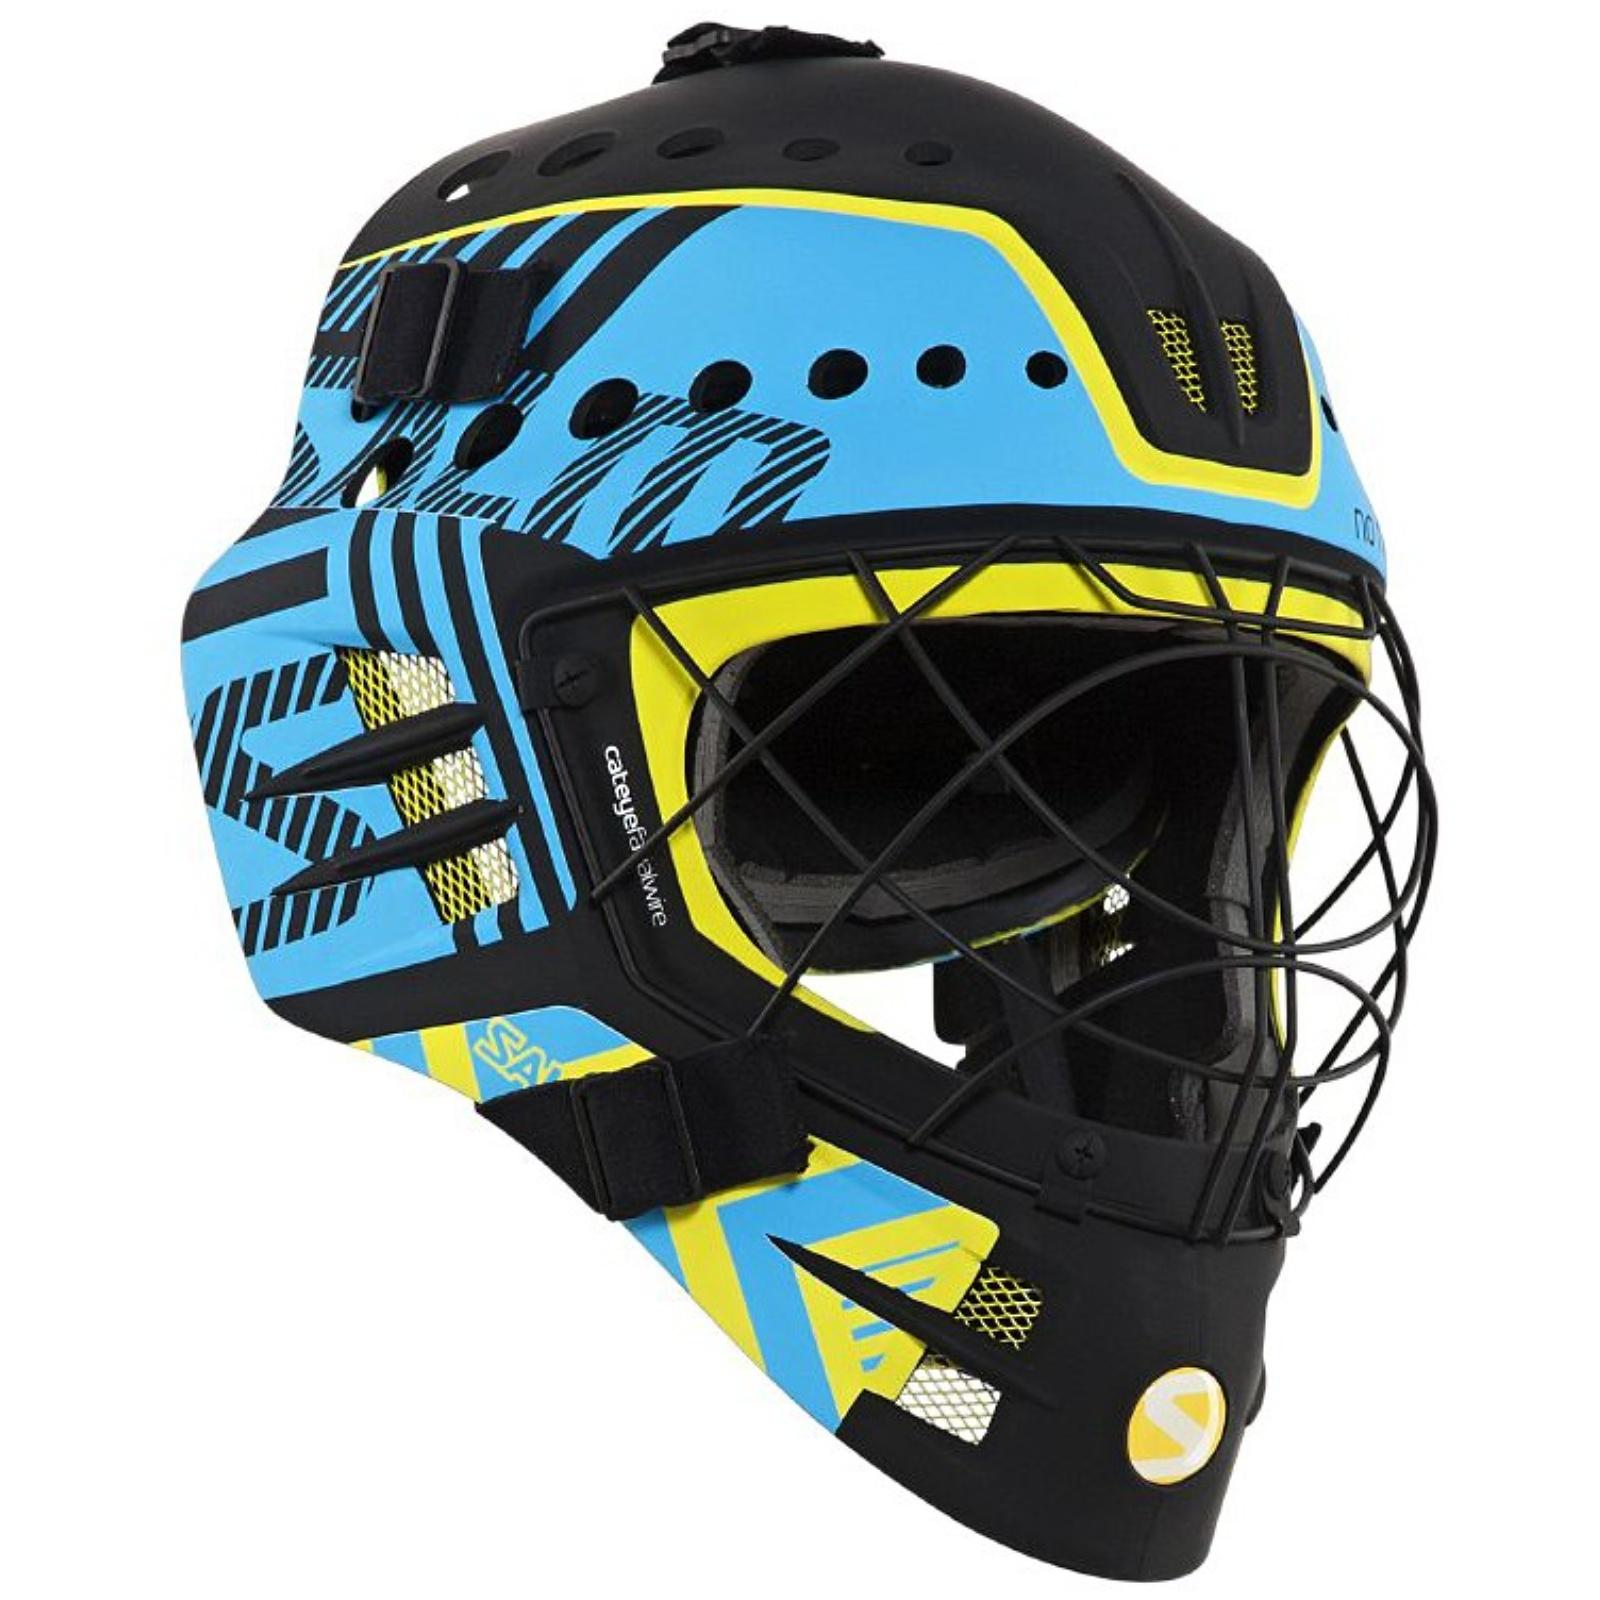 Florbalová maska SALMING Travis Elite Helmet černo-modrá